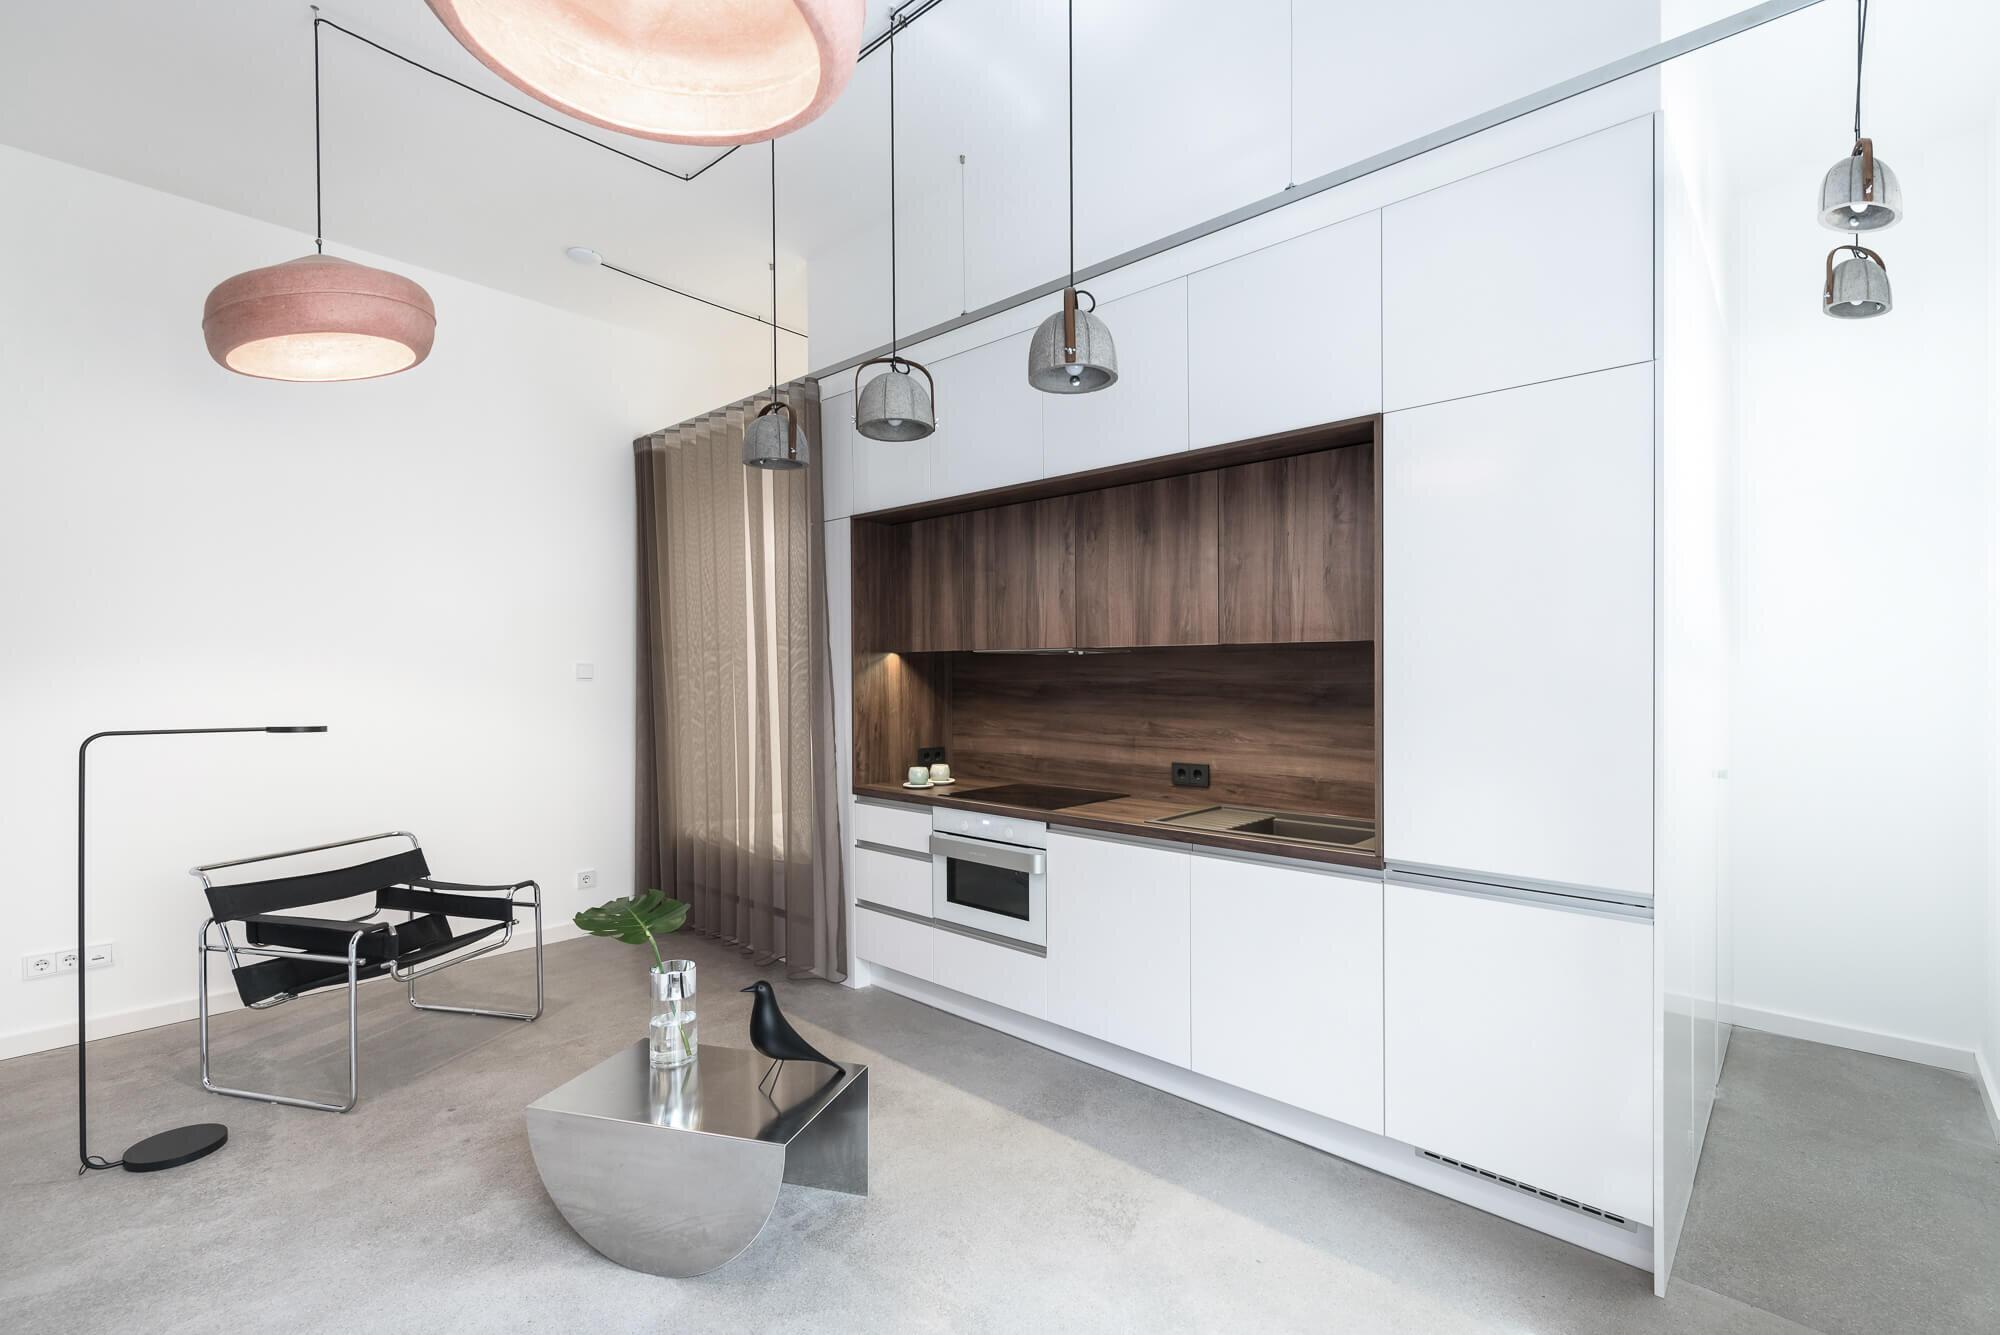 Translucent-spaces-batlab-architects-Hungary-6